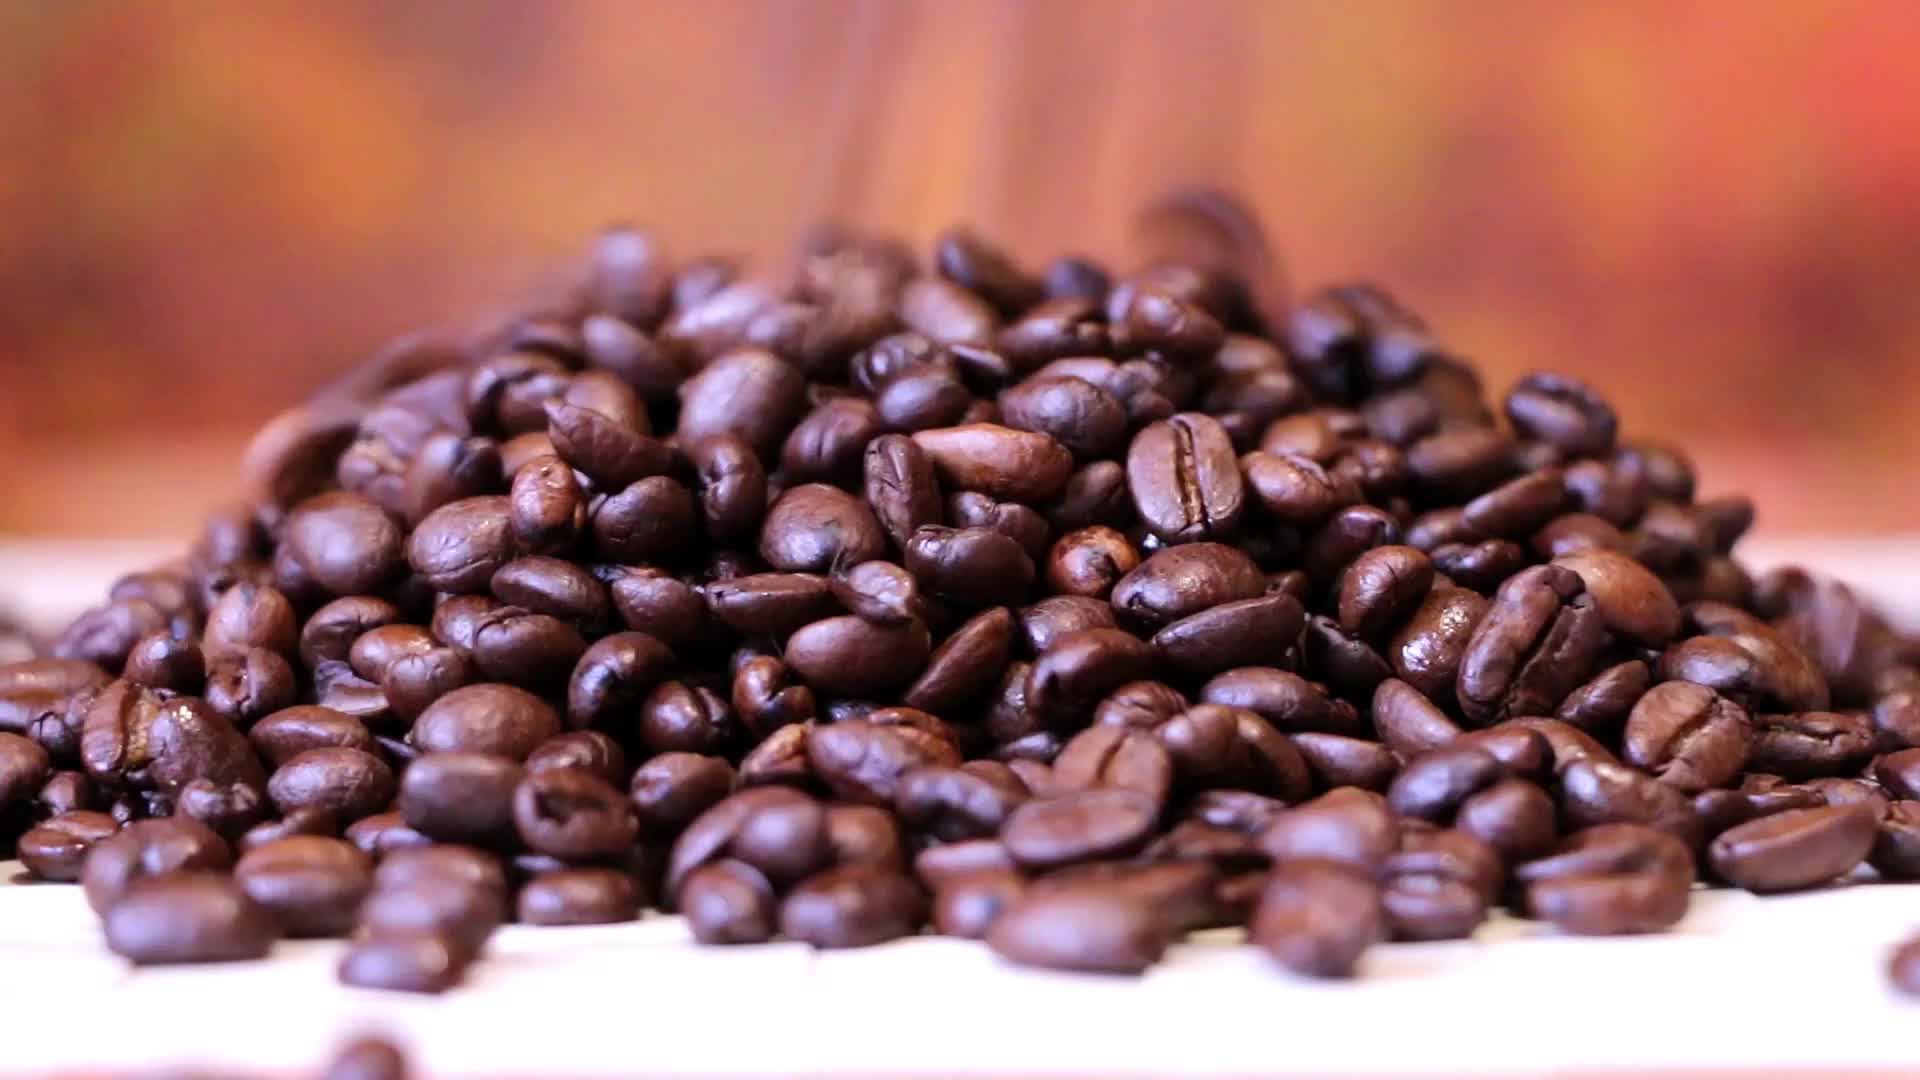 Coffee-top GIFs